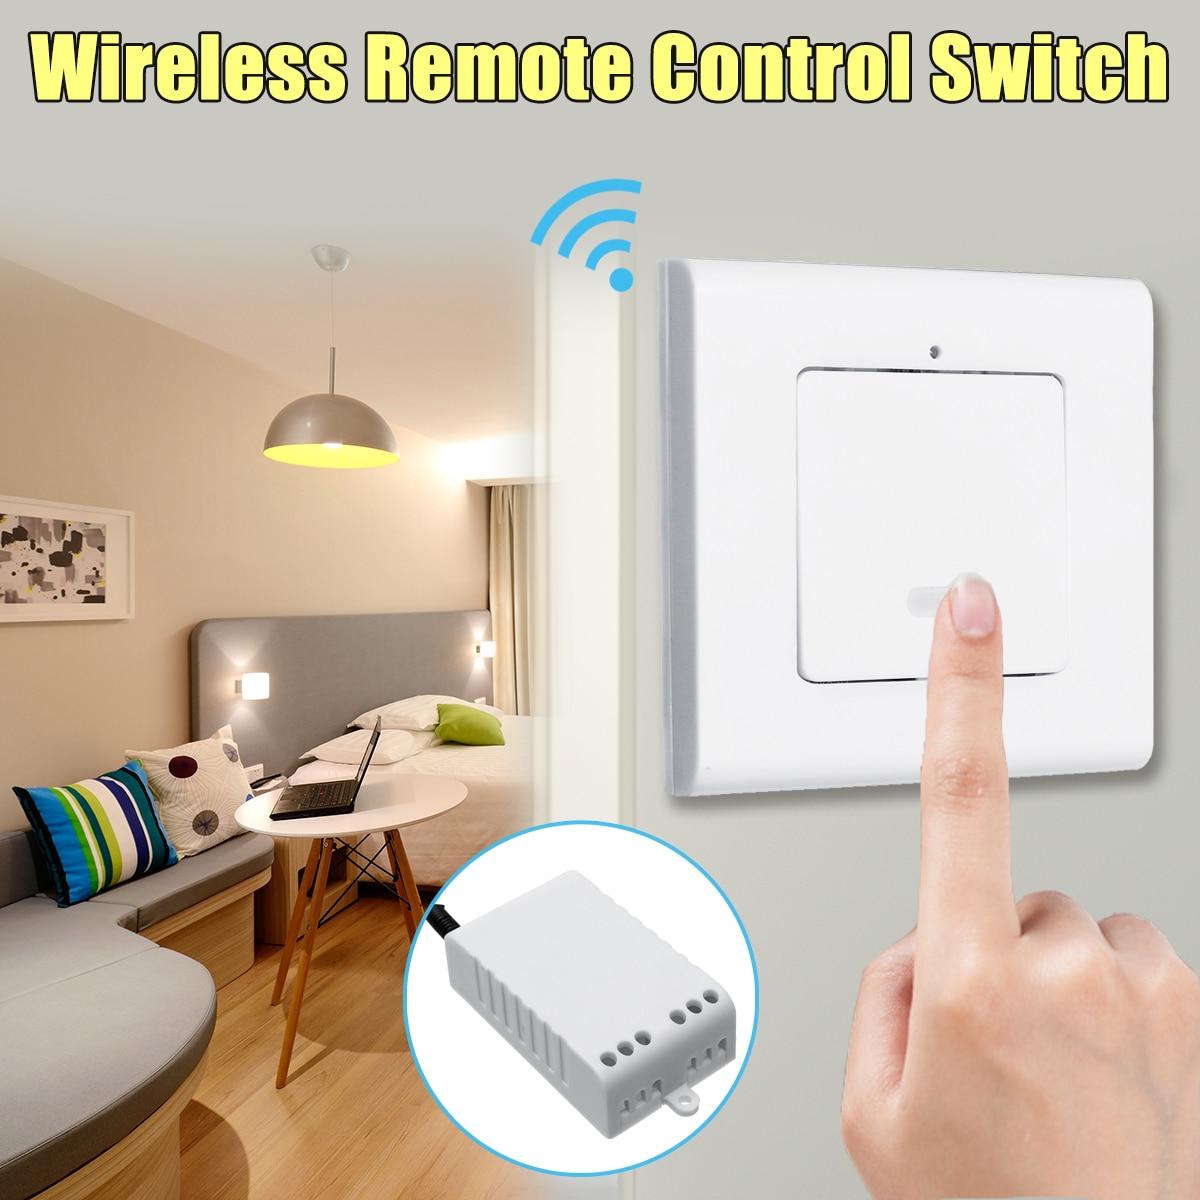 цена на 1 Way Wall Lamp Wireless Remote Control ON/OFF Light Switch + Receiver AC220V